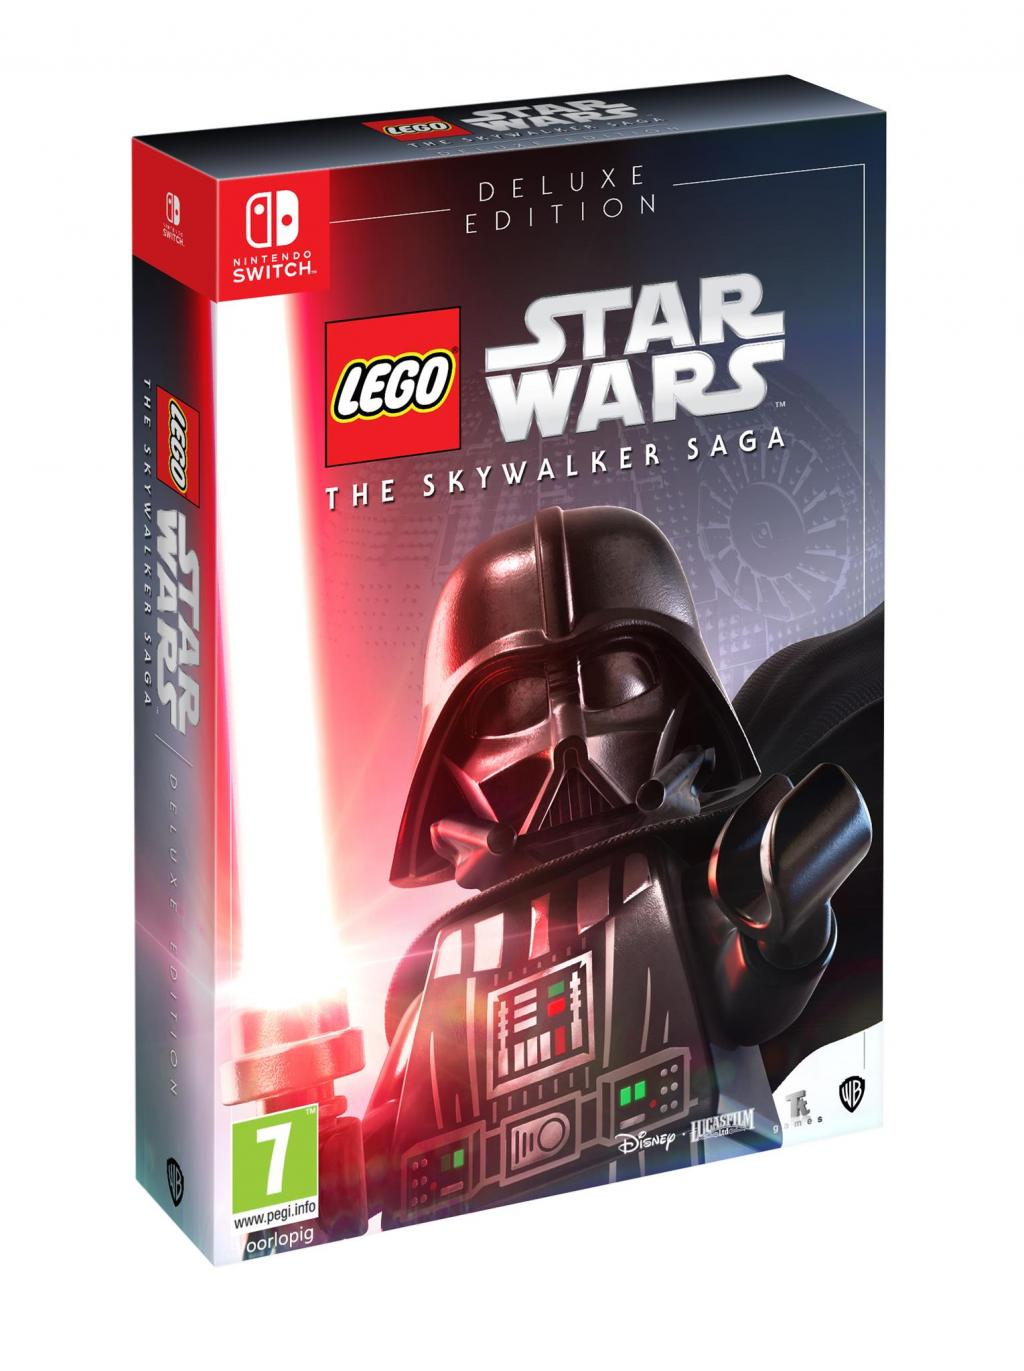 LEGO Star Wars : The Skywalker Saga Deluxe_1